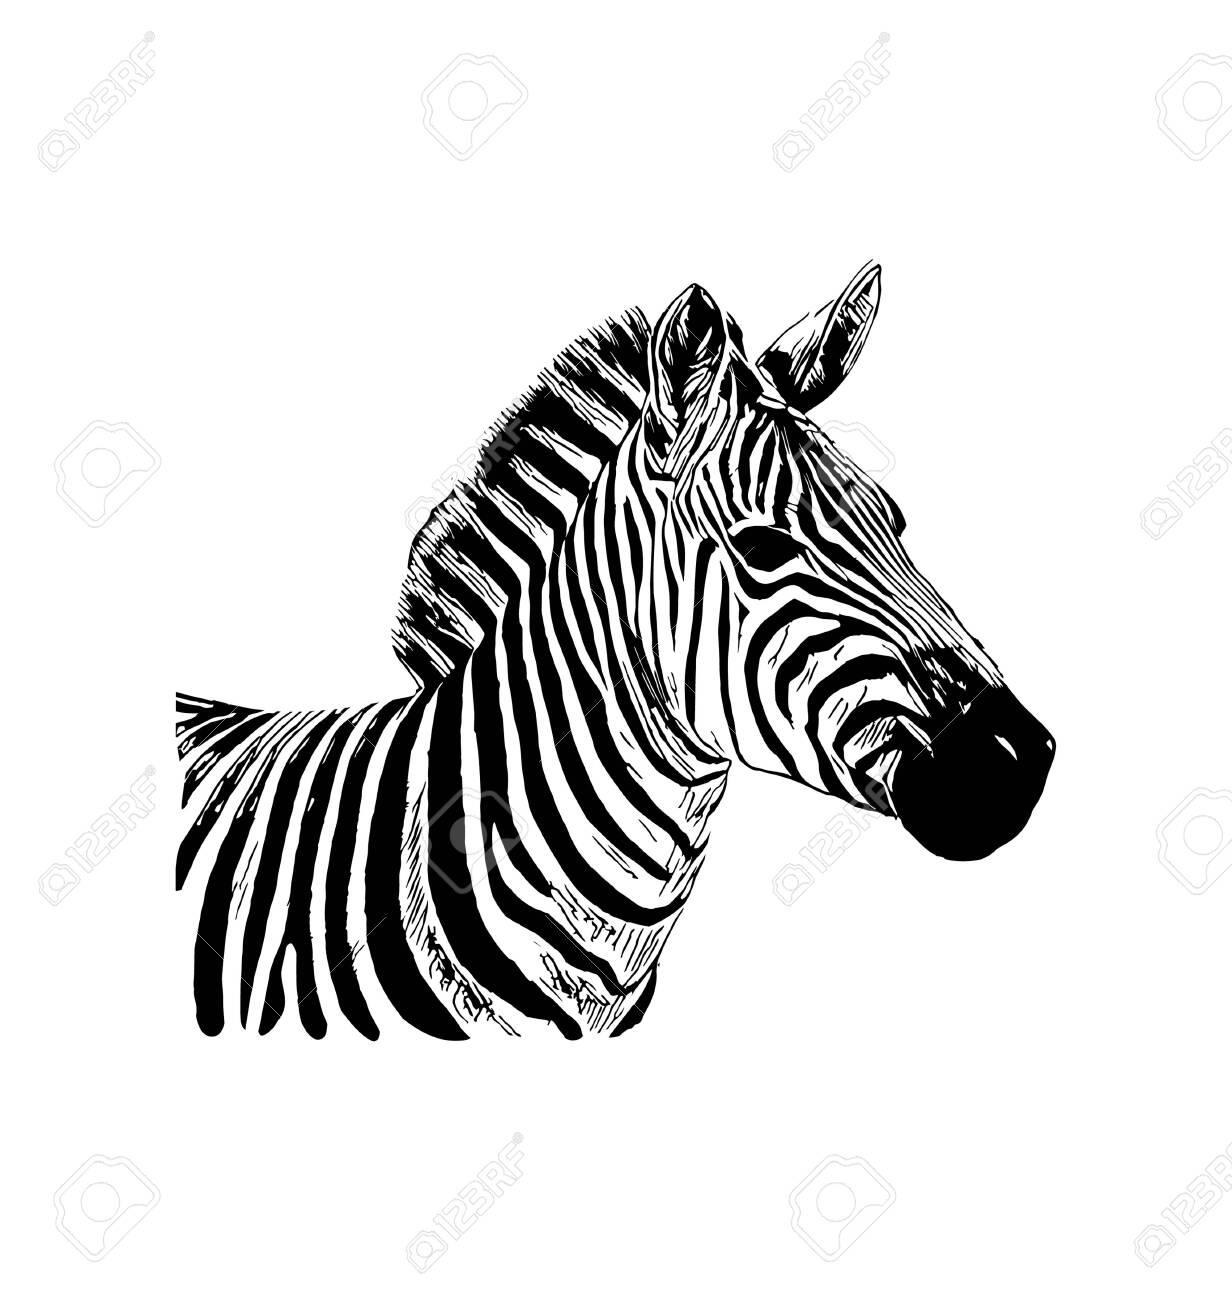 Zebra vector graphic illustration on white background - 124460652